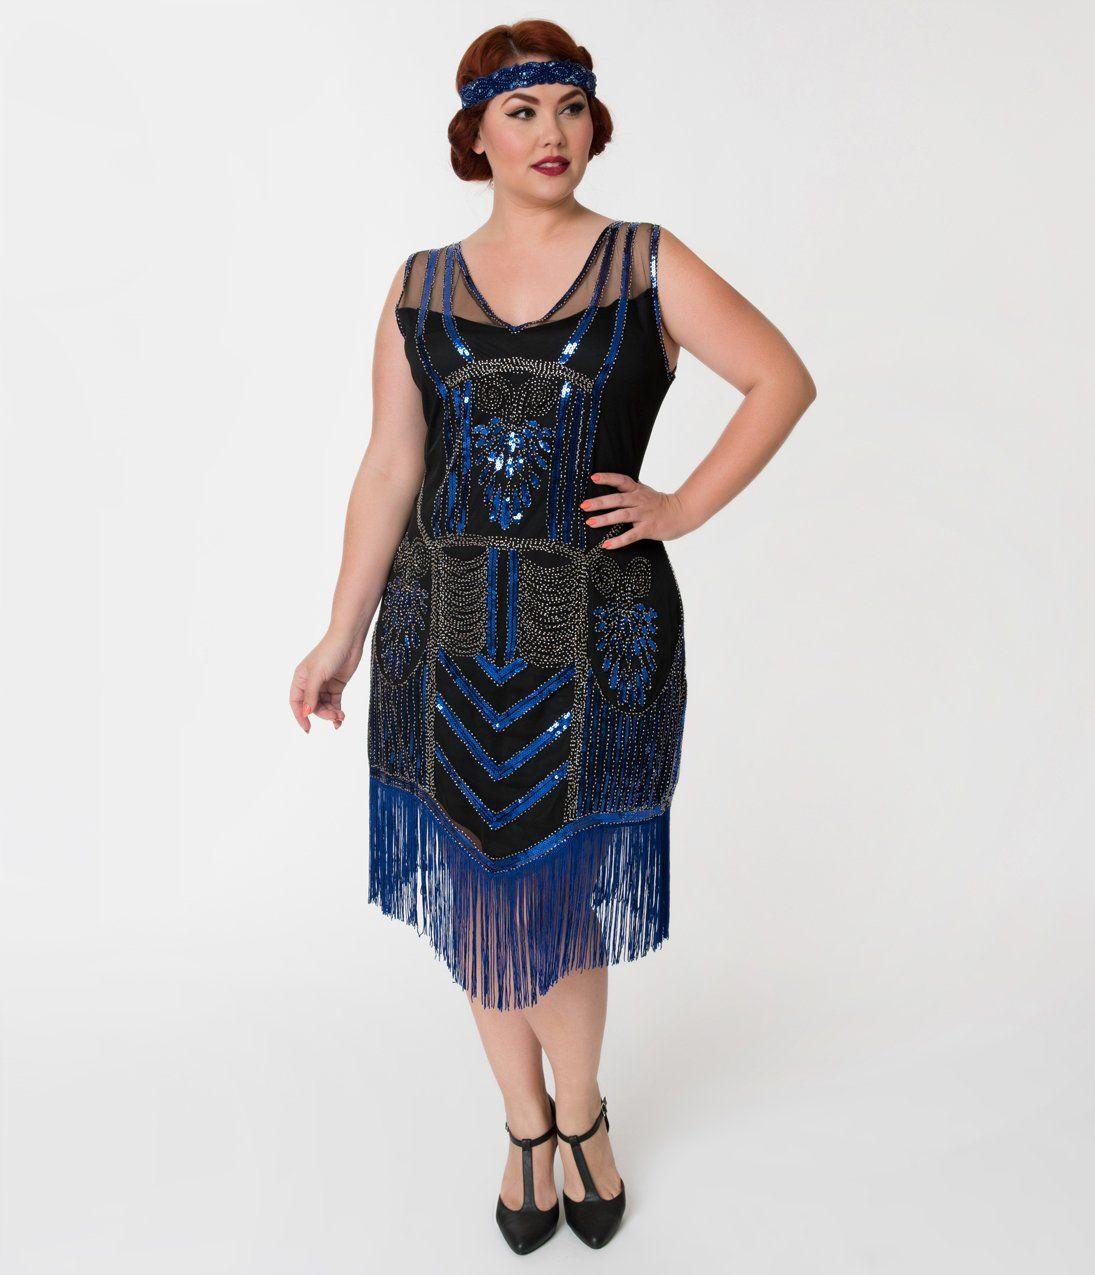 1920s Style Dresses 20s Dresses Plus Size Black Dresses Dresses Vintage Inspired Cocktail Dress [ 1275 x 1095 Pixel ]